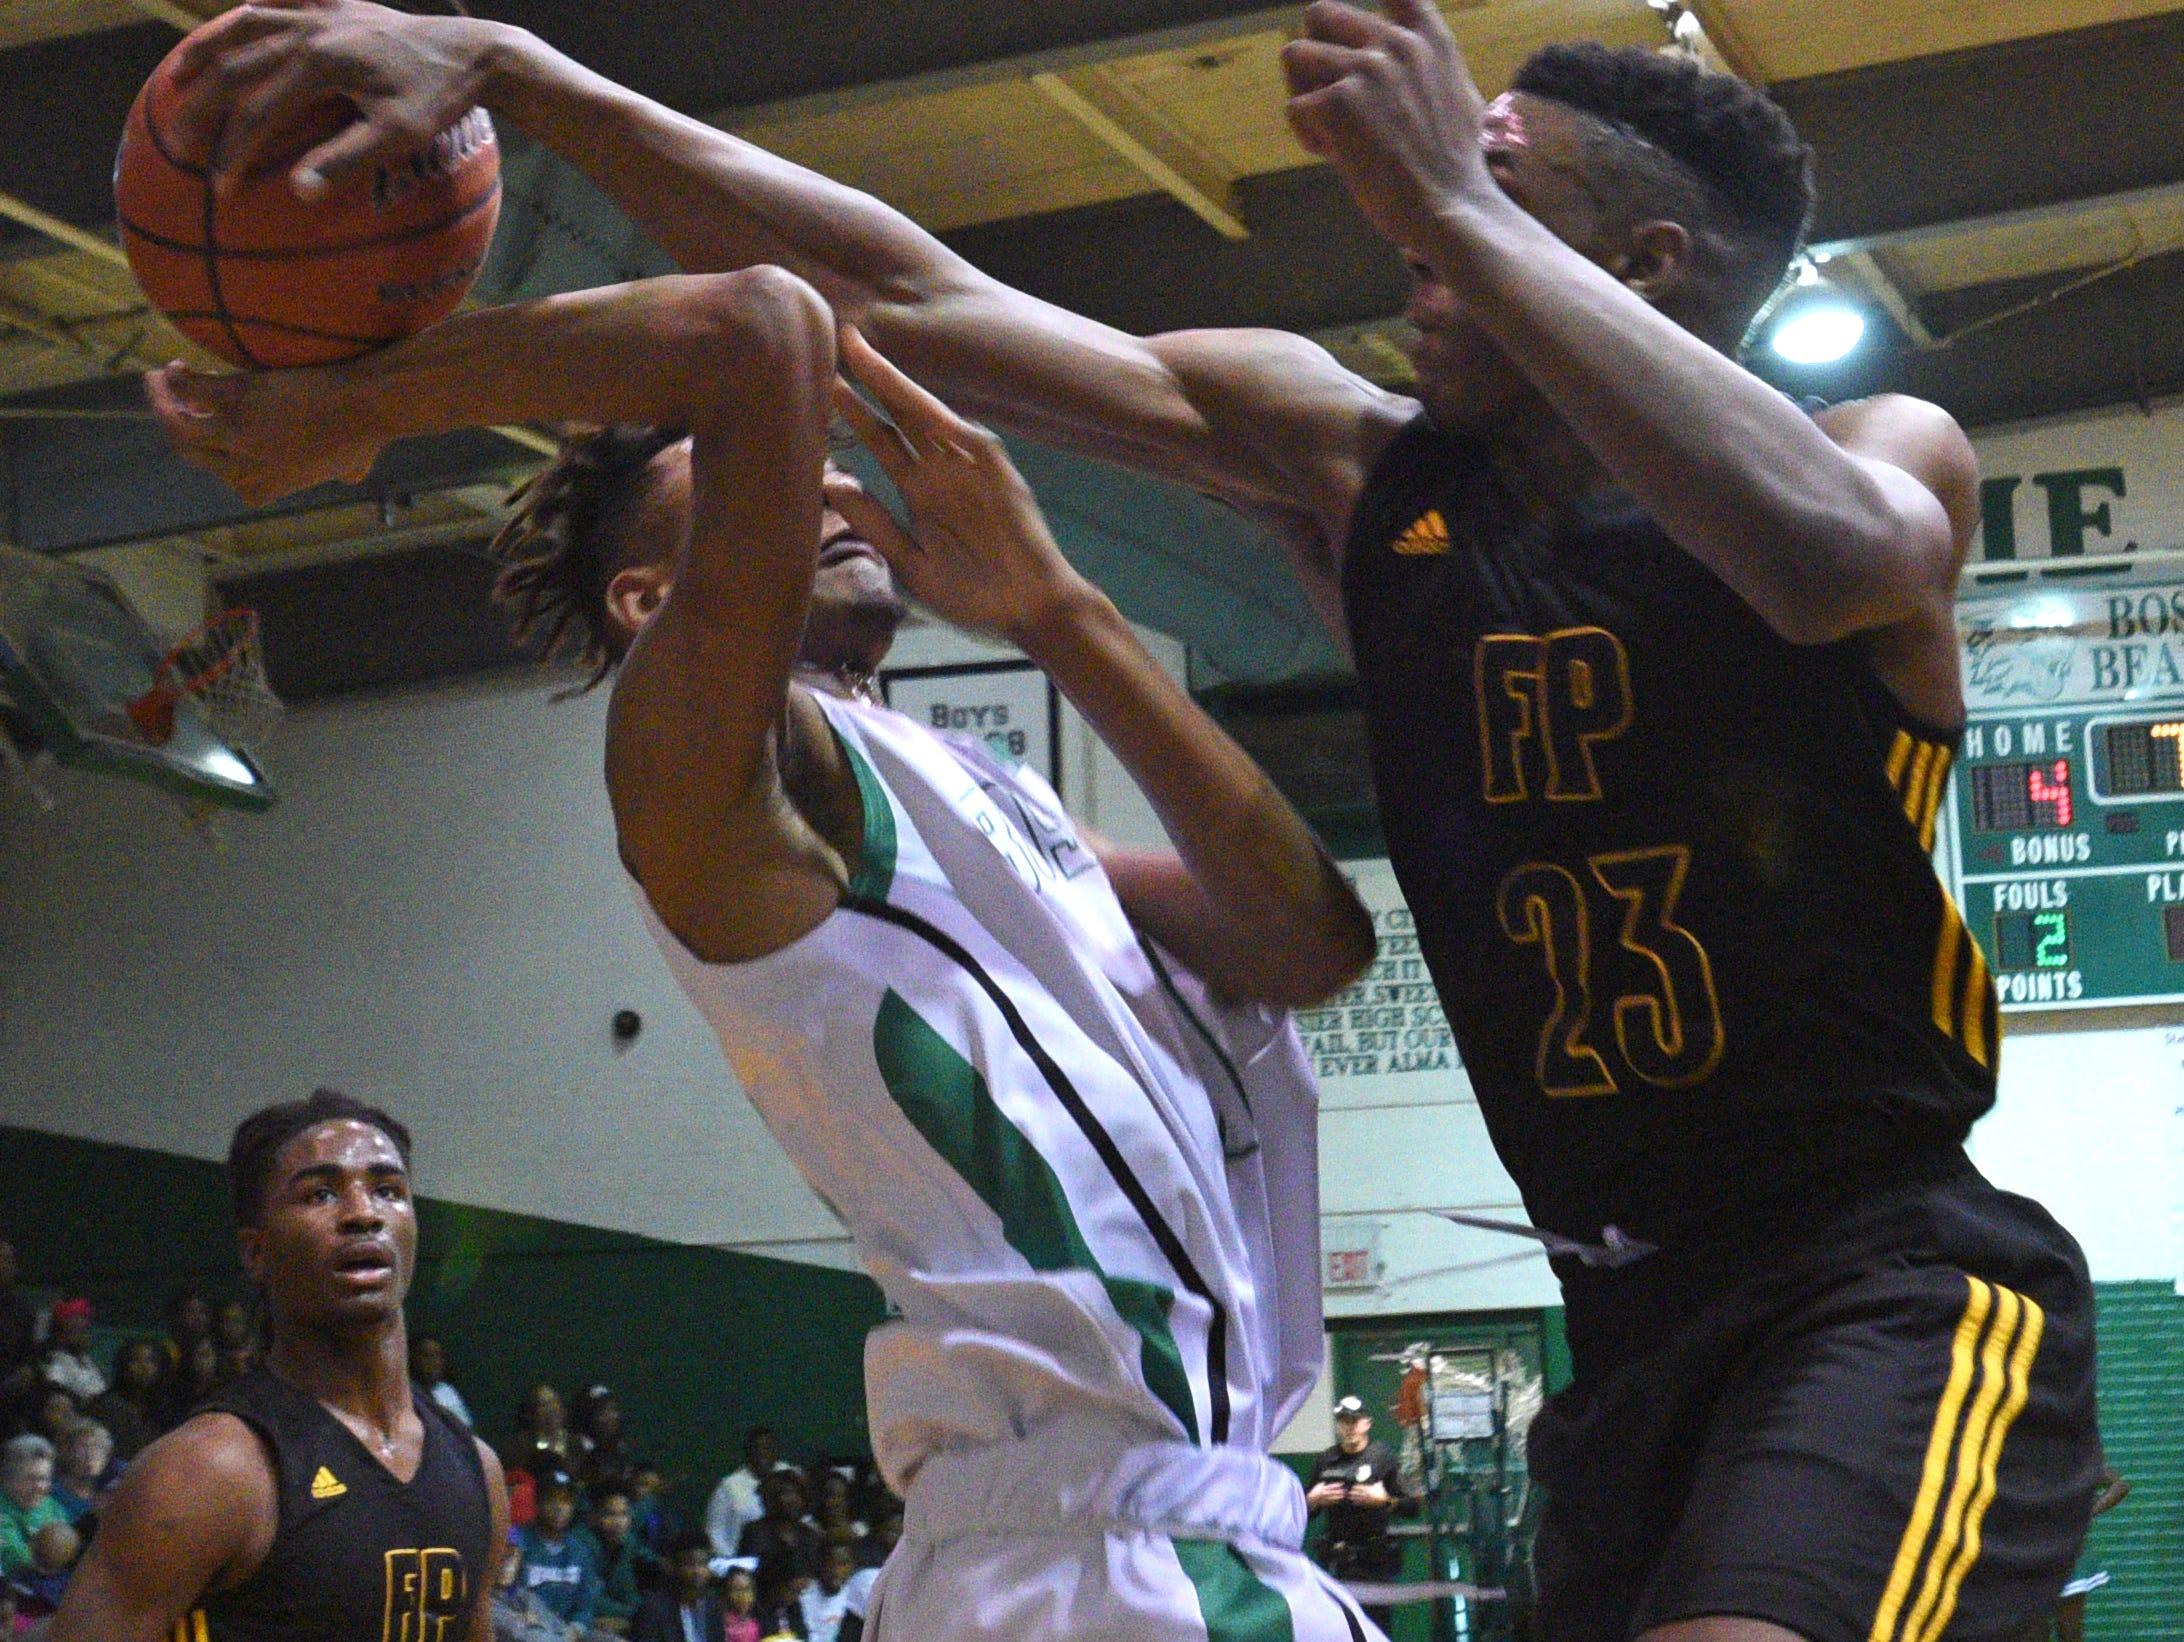 Fair Park's Latreavin Black blocks a shot against Bossier at the Bossier Invitational boys basketball tournament championship game.